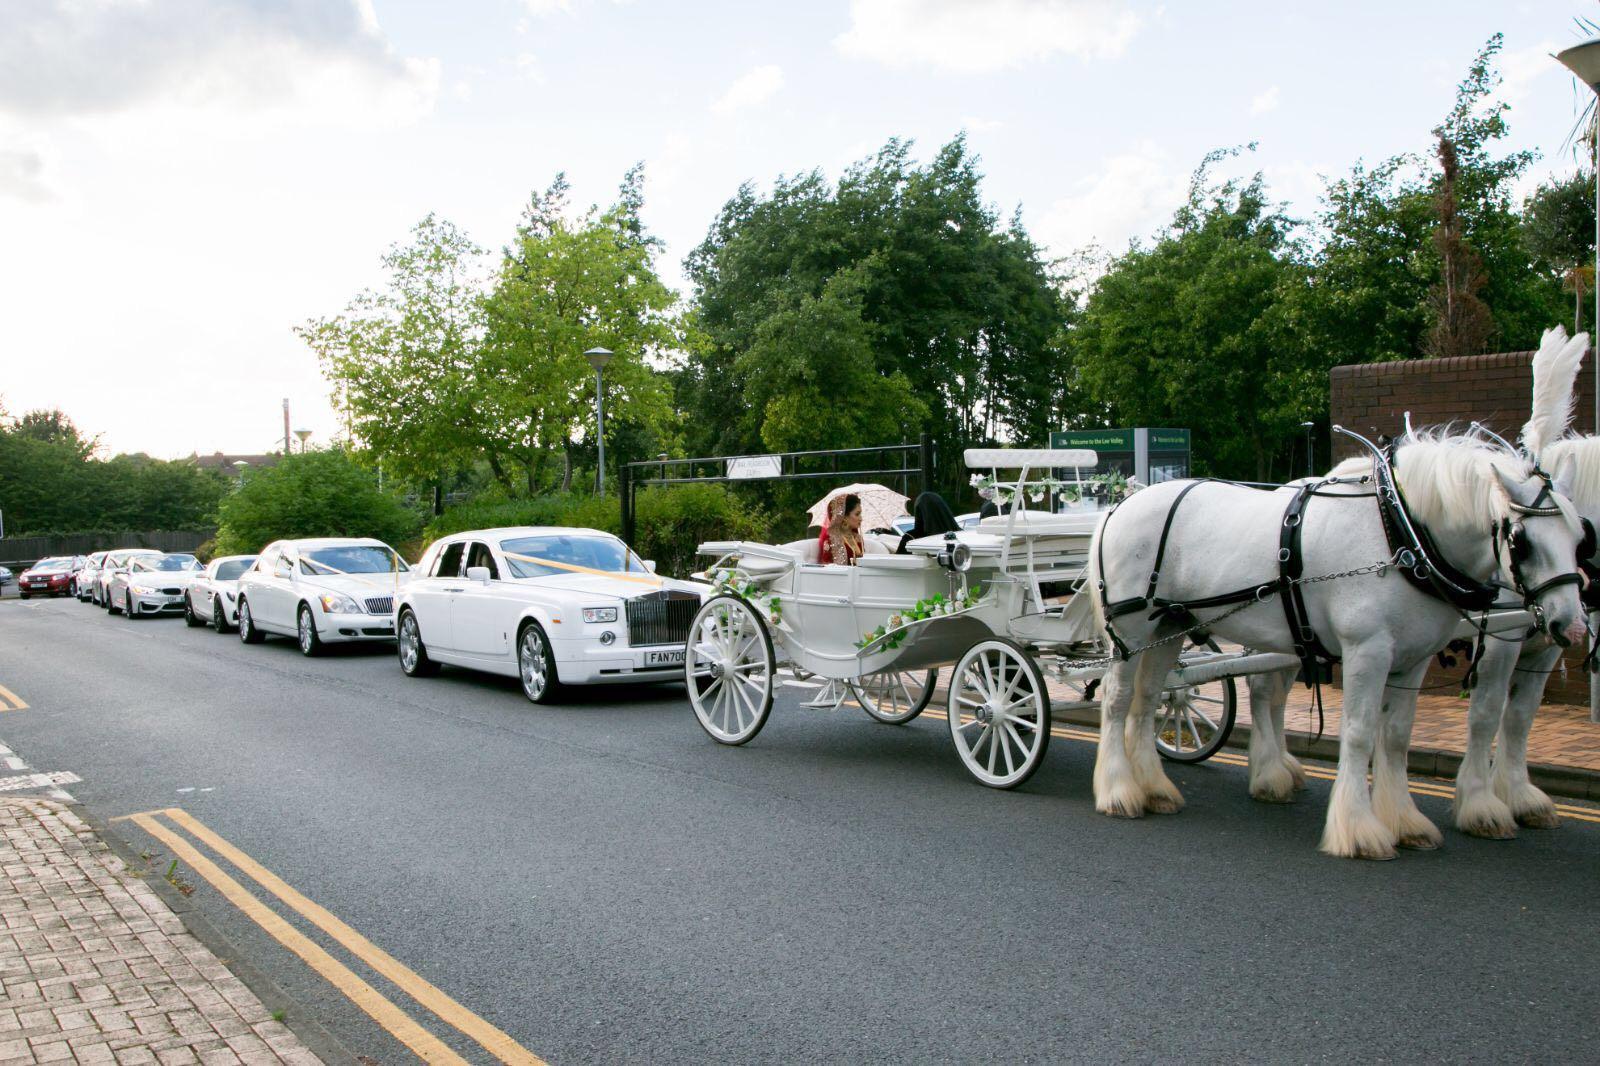 Summer Weddings at Bushey Country Club